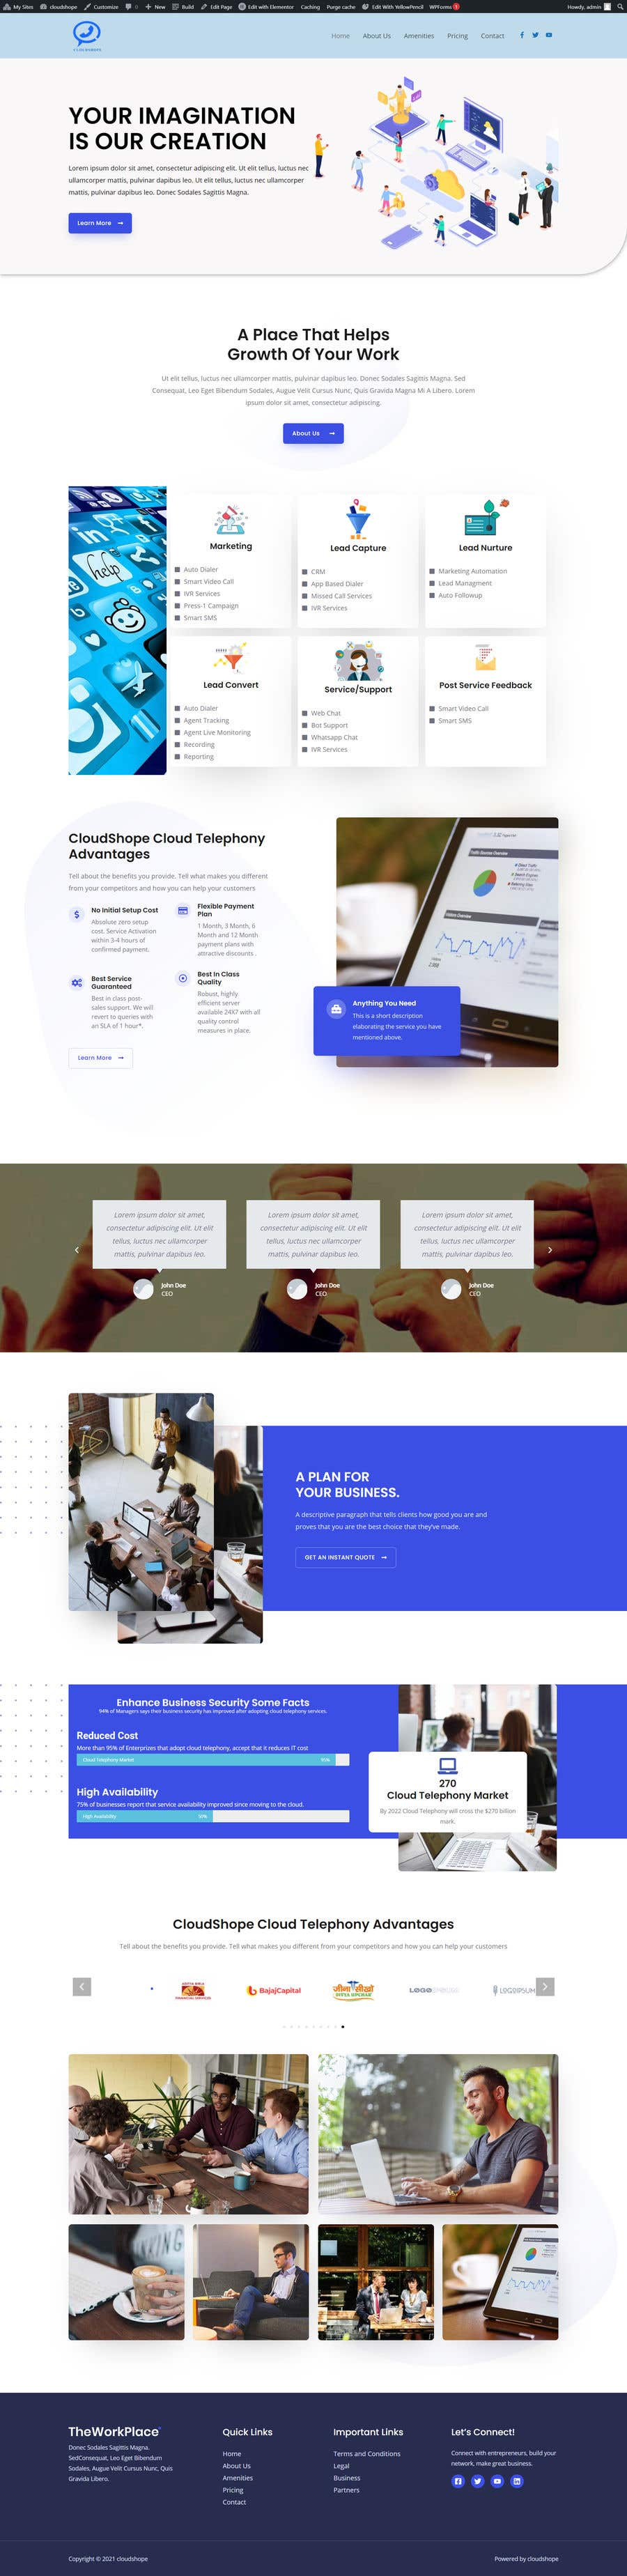 Konkurrenceindlæg #                                        5                                      for                                         Build Excellent Front Page Of our website - 14/05/2021 12:47 EDT